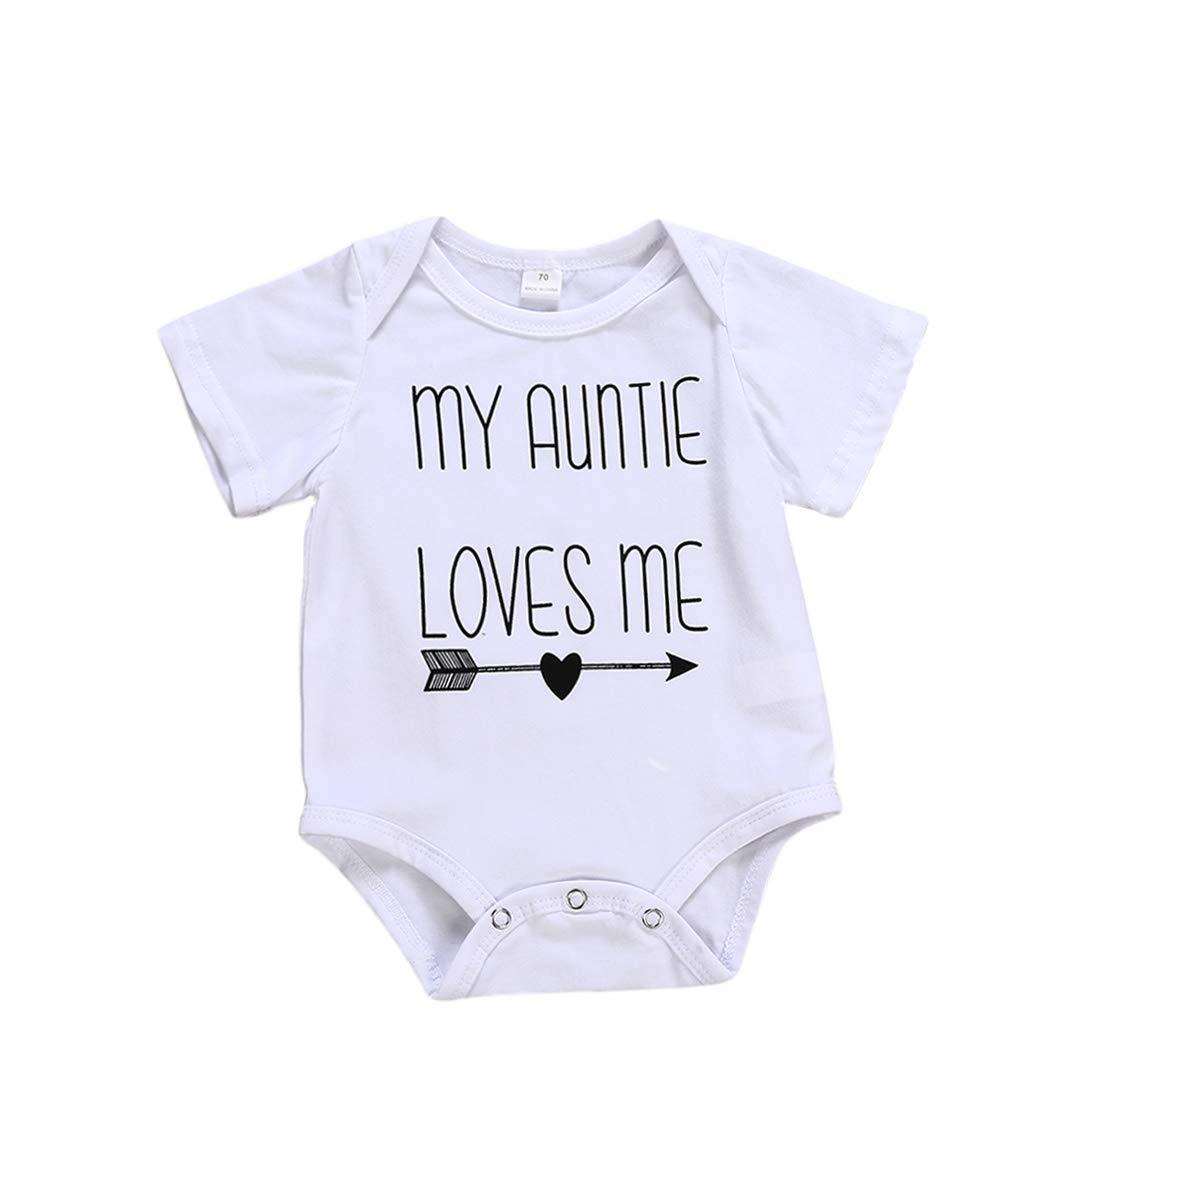 Infant Boy Girl Romper Toddler Baby My Auntie Loves Me Onesies Bodysuit Outfit Bebogo CA18823878